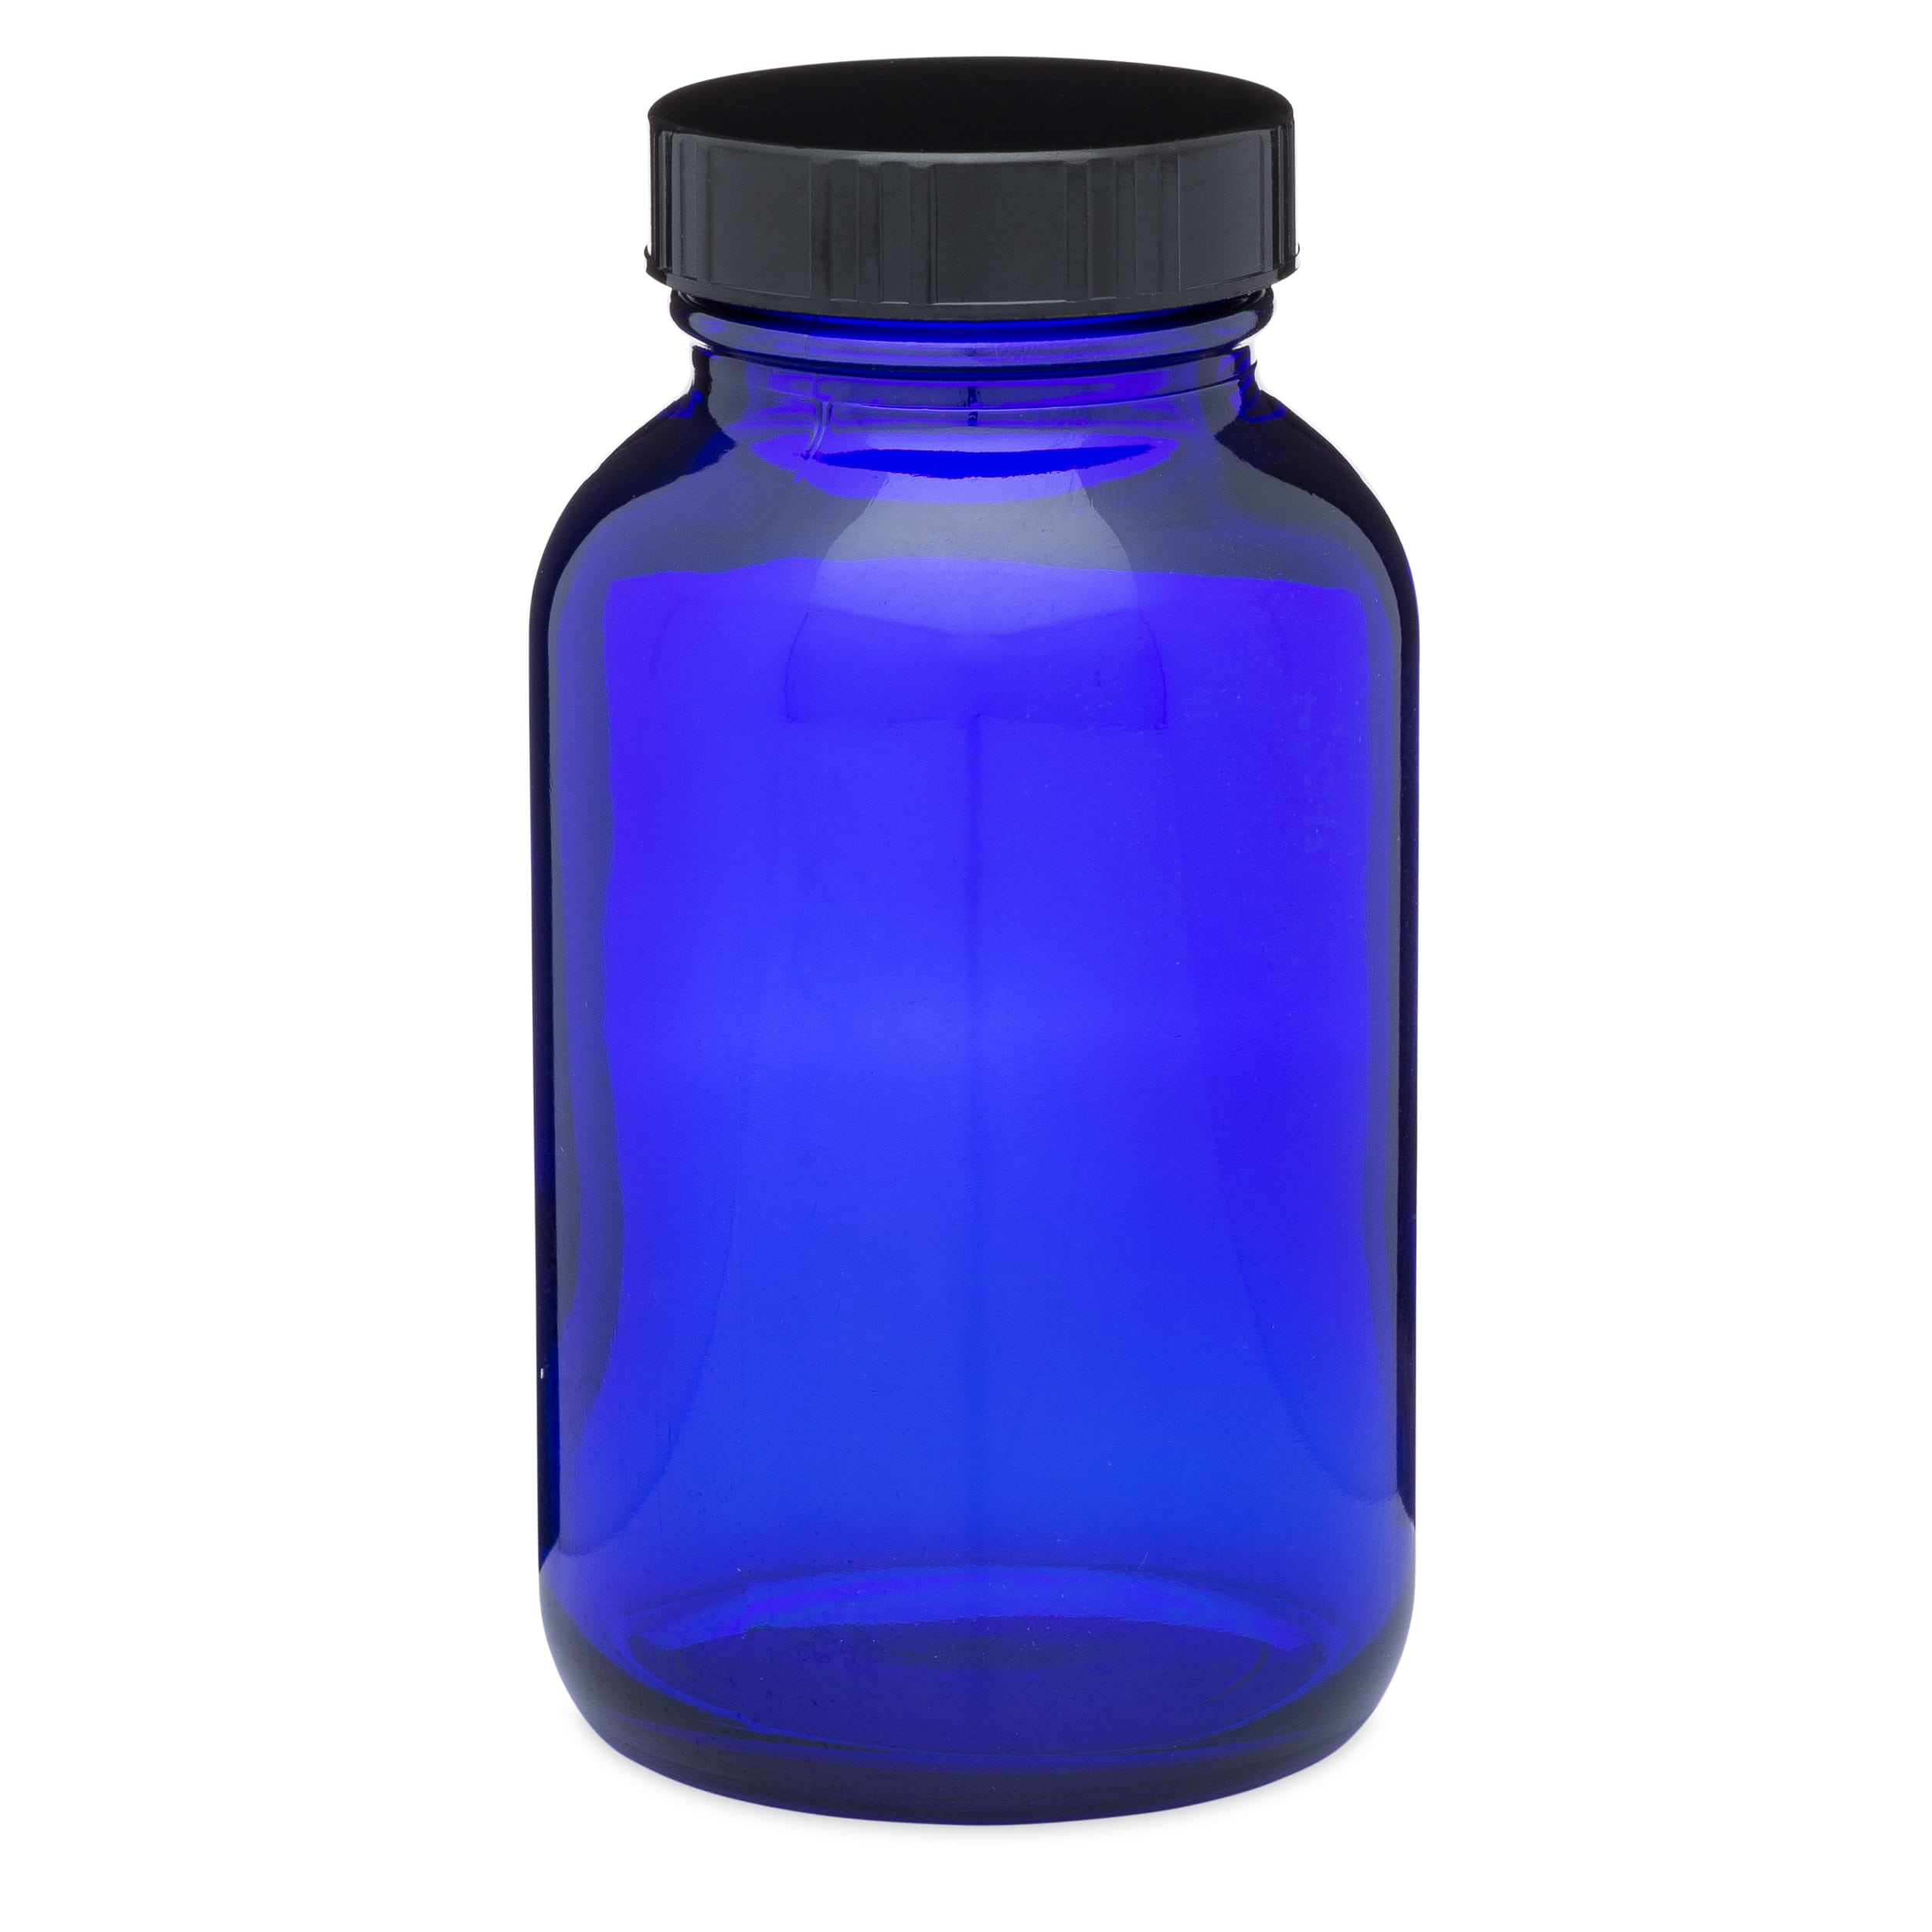 Blue Packer Bottle with Black Cap